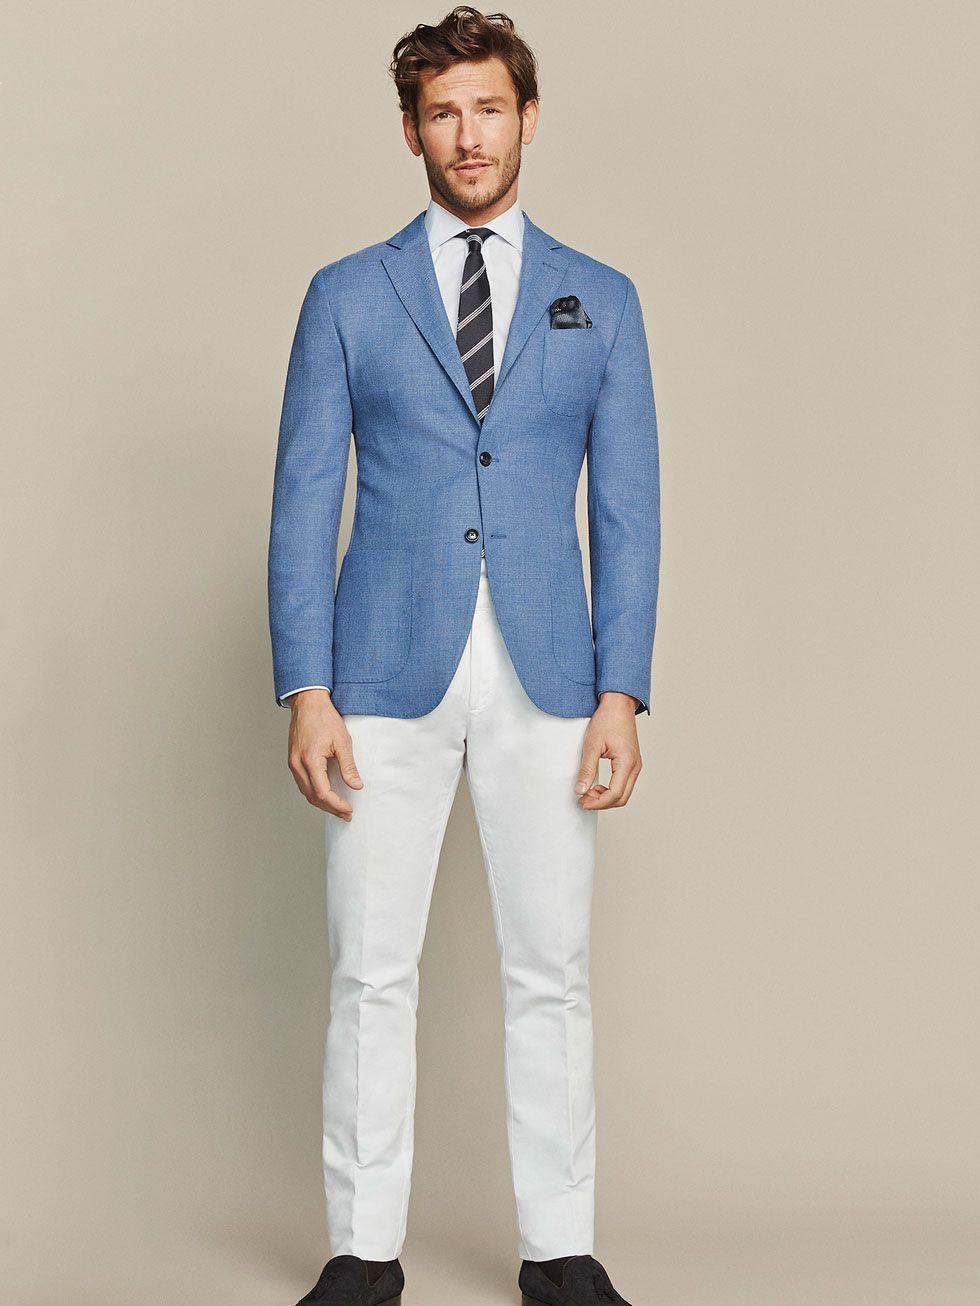 Jackets and waistcoats - MEN - Massimo Dutti | Summer Suits ...